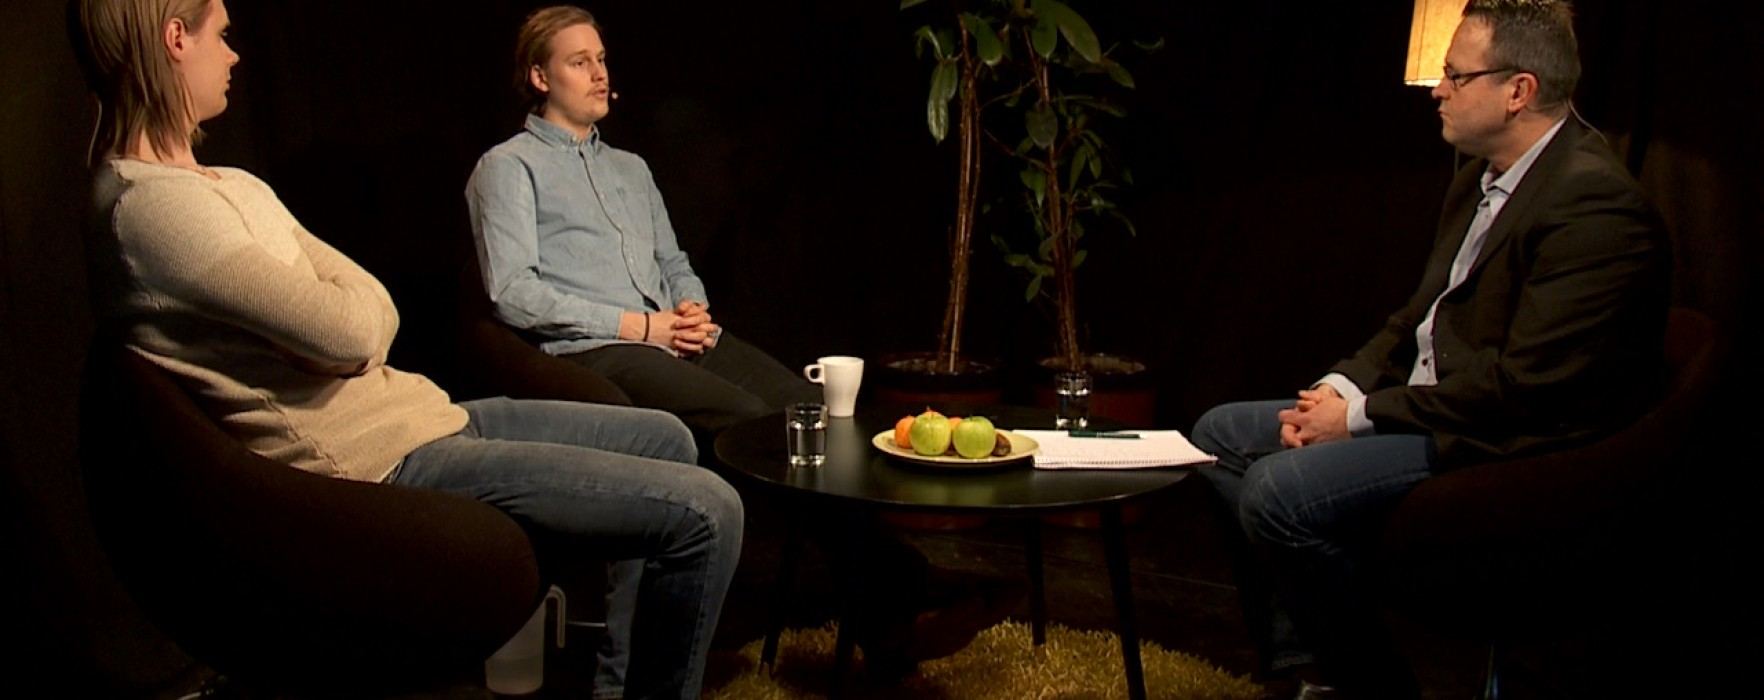 Glimt Sport – Adam och Tom Colling, Karlstads innebandy